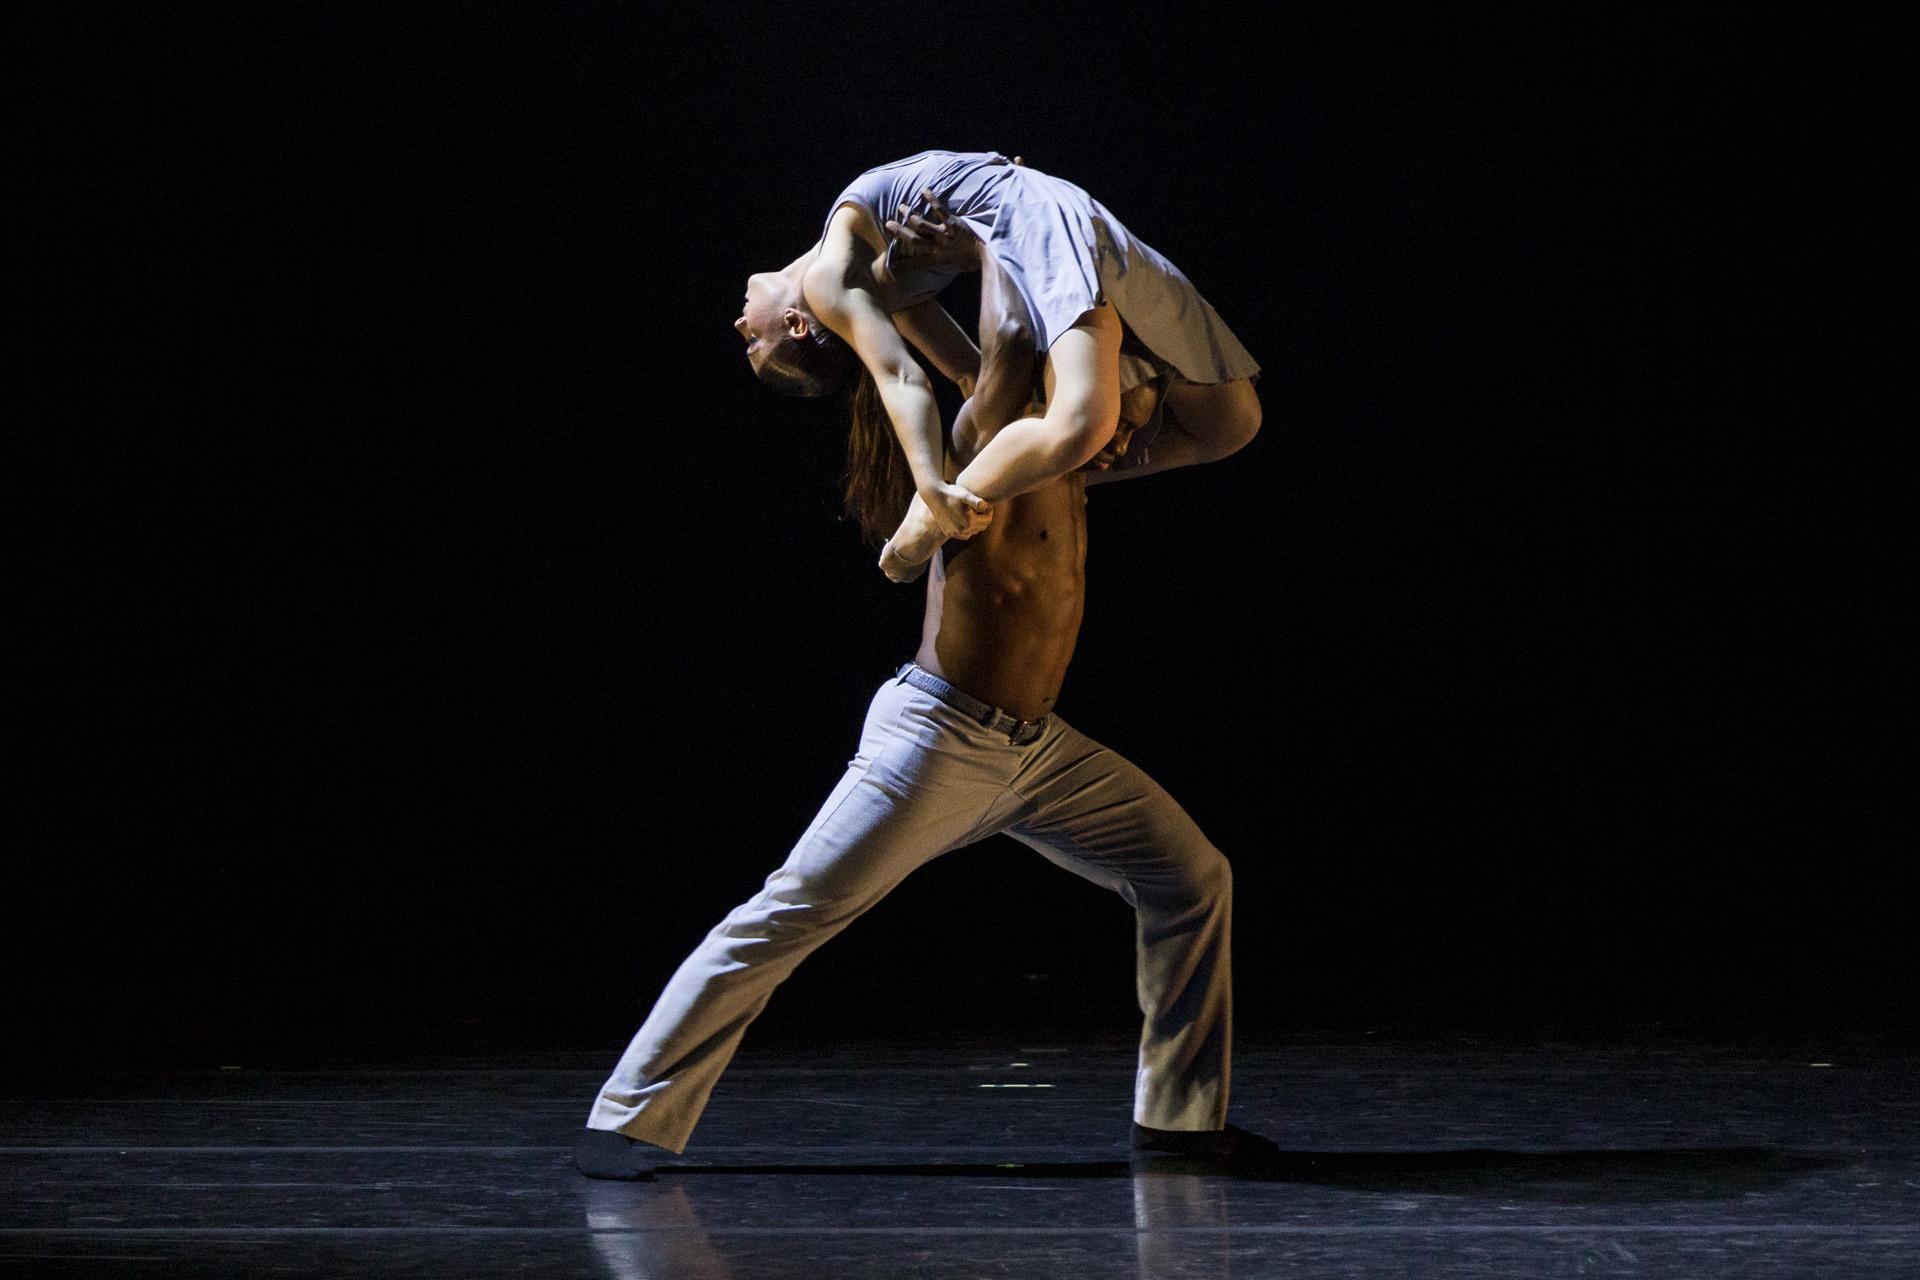 2019_03_01-Parsons-Dance-©-Luca-Vantusso-211546-EOSR0575